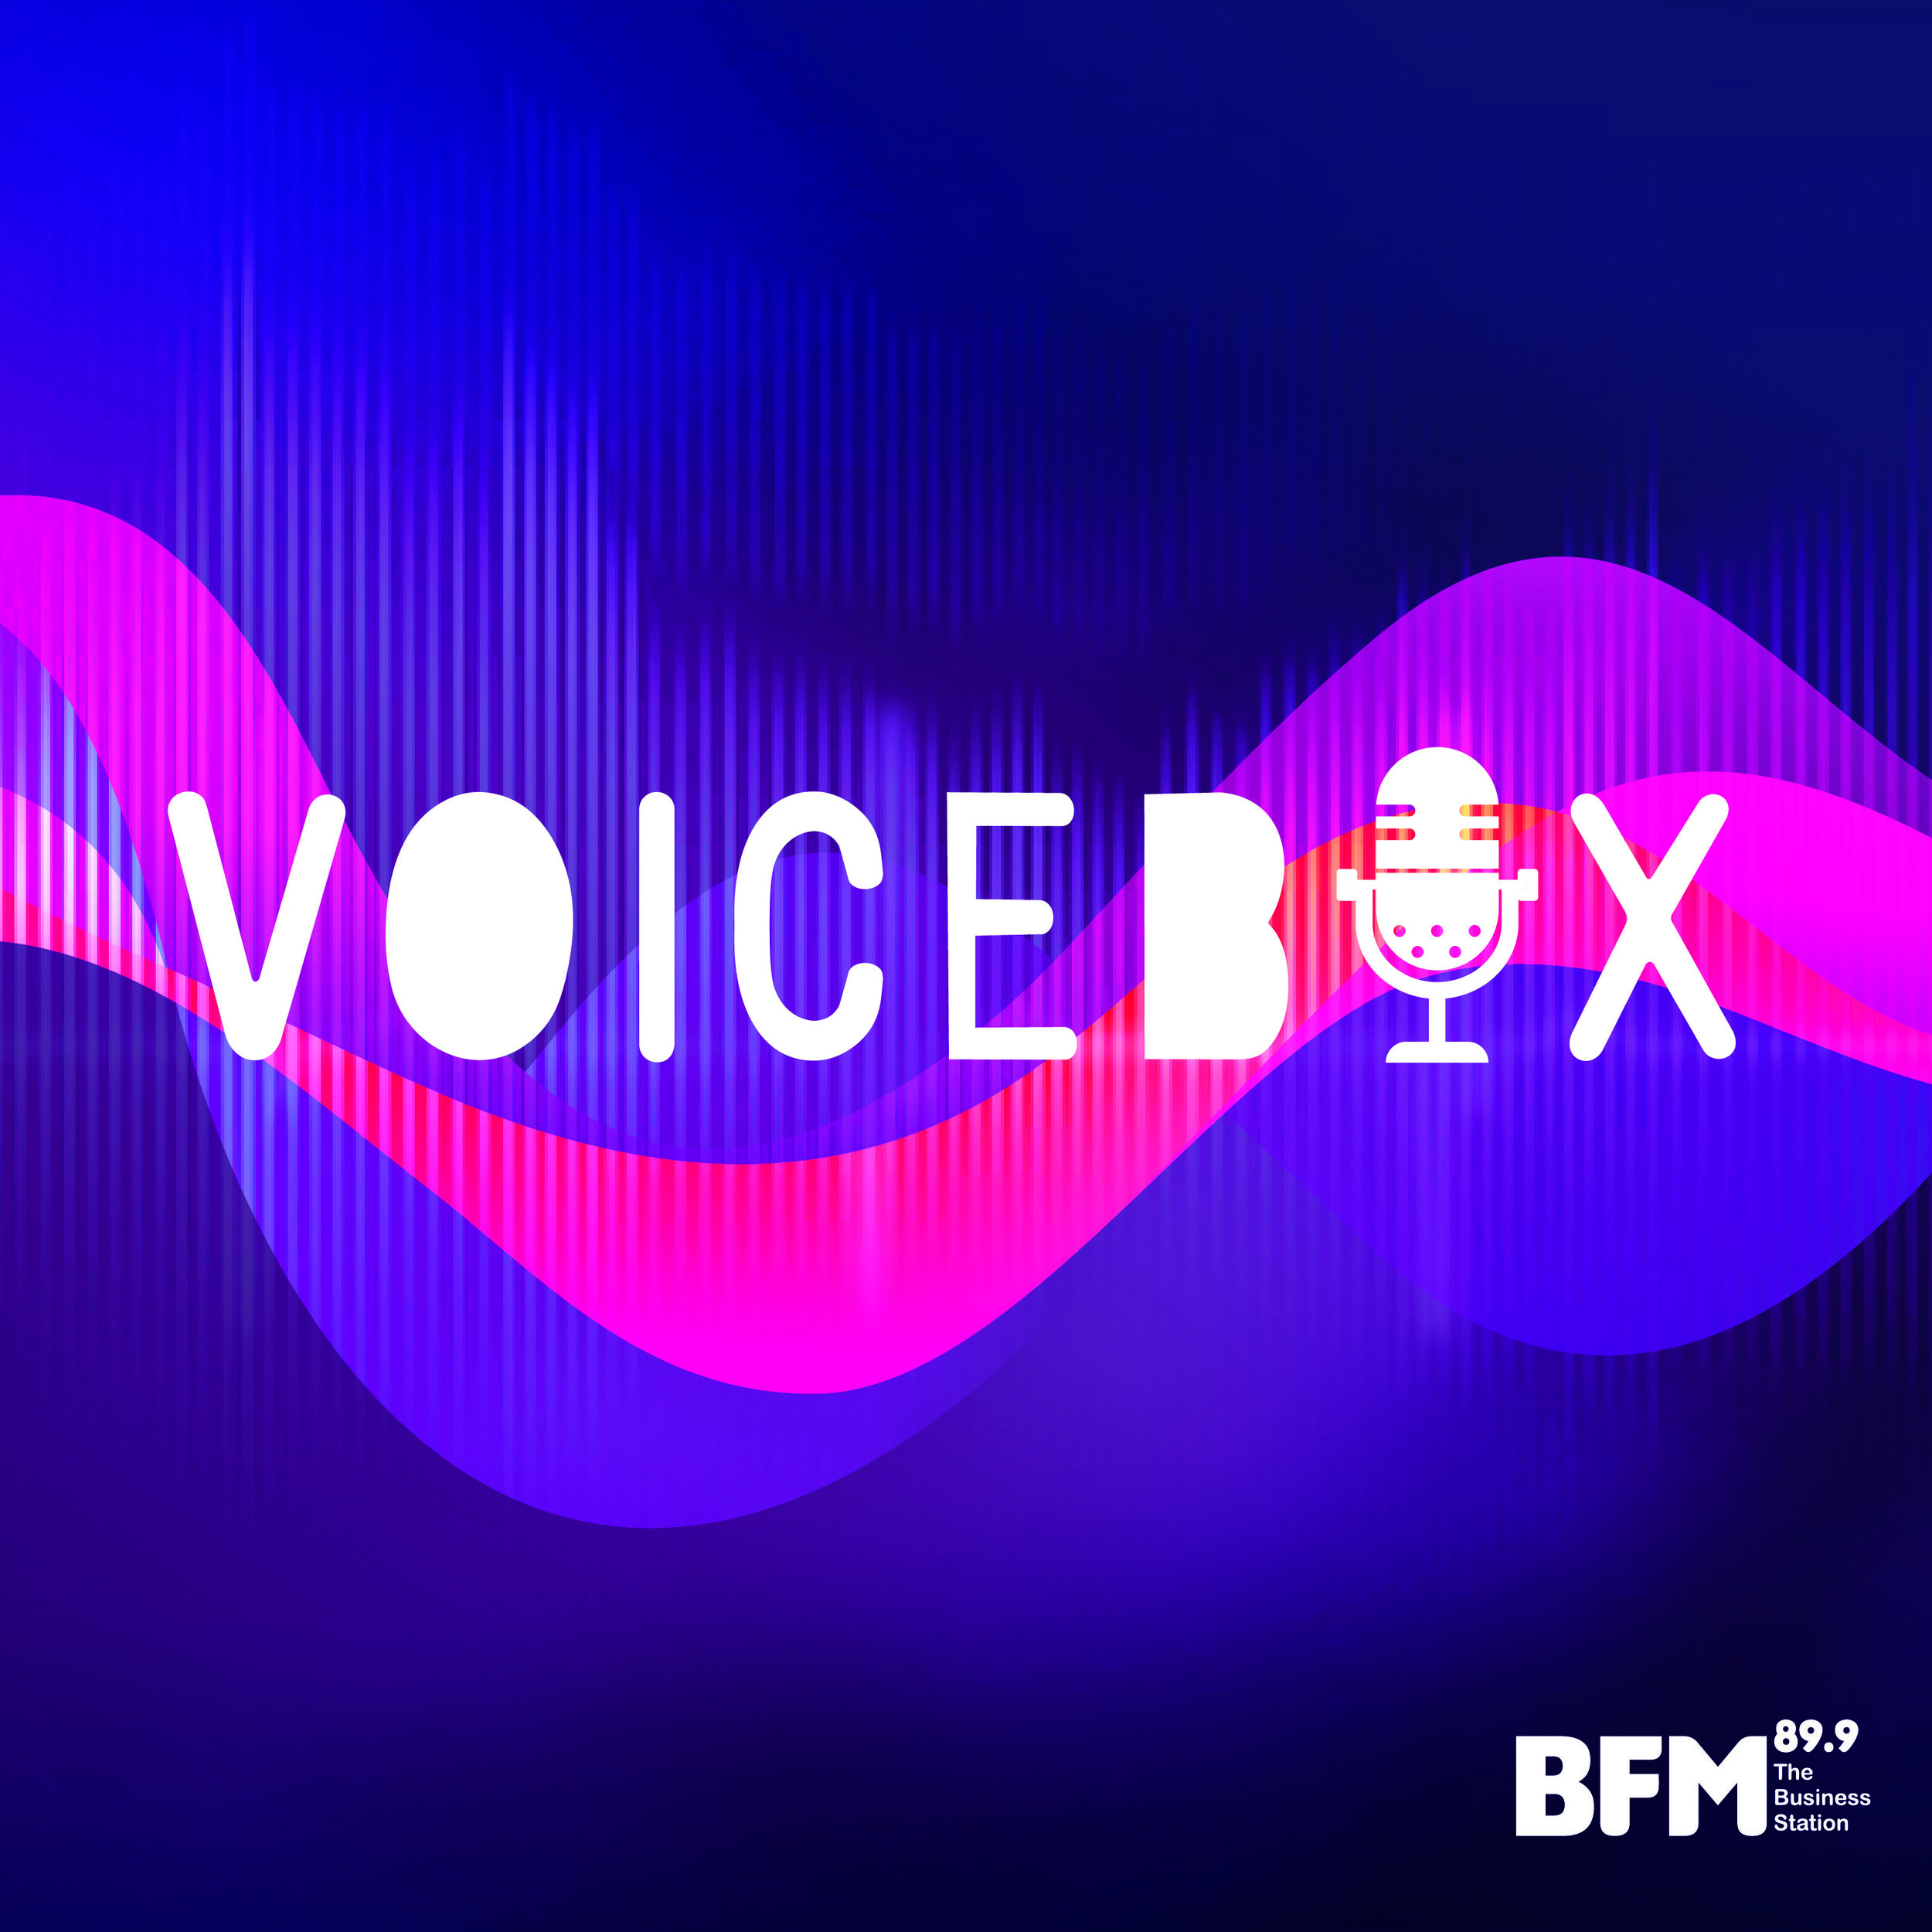 Voicebox-07.jpg